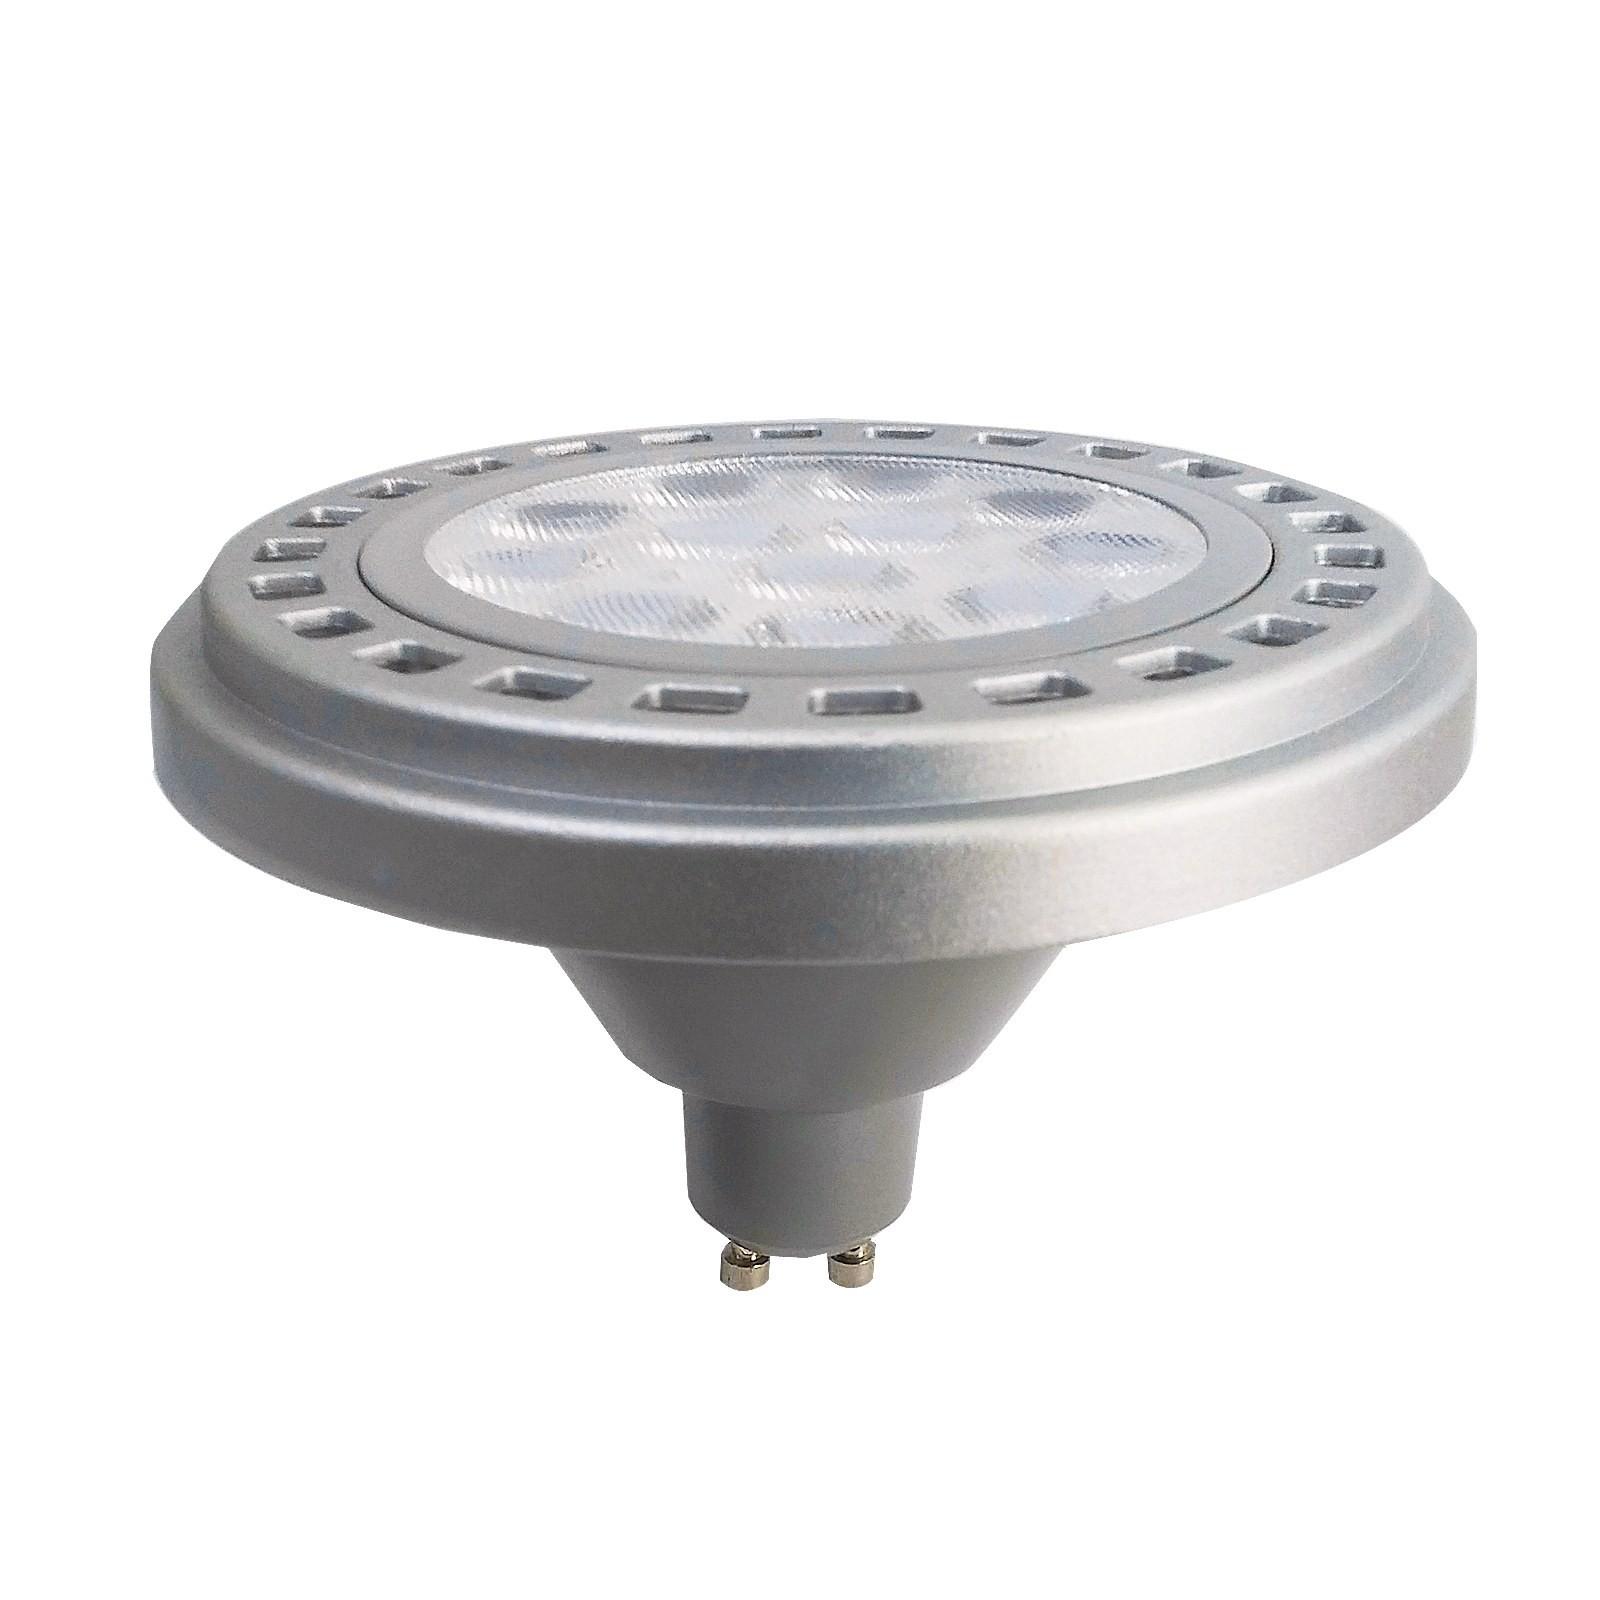 lampadina lampada a led gu10 12w faretto luce bianca calda r111 spot vultech life amc hikvision. Black Bedroom Furniture Sets. Home Design Ideas